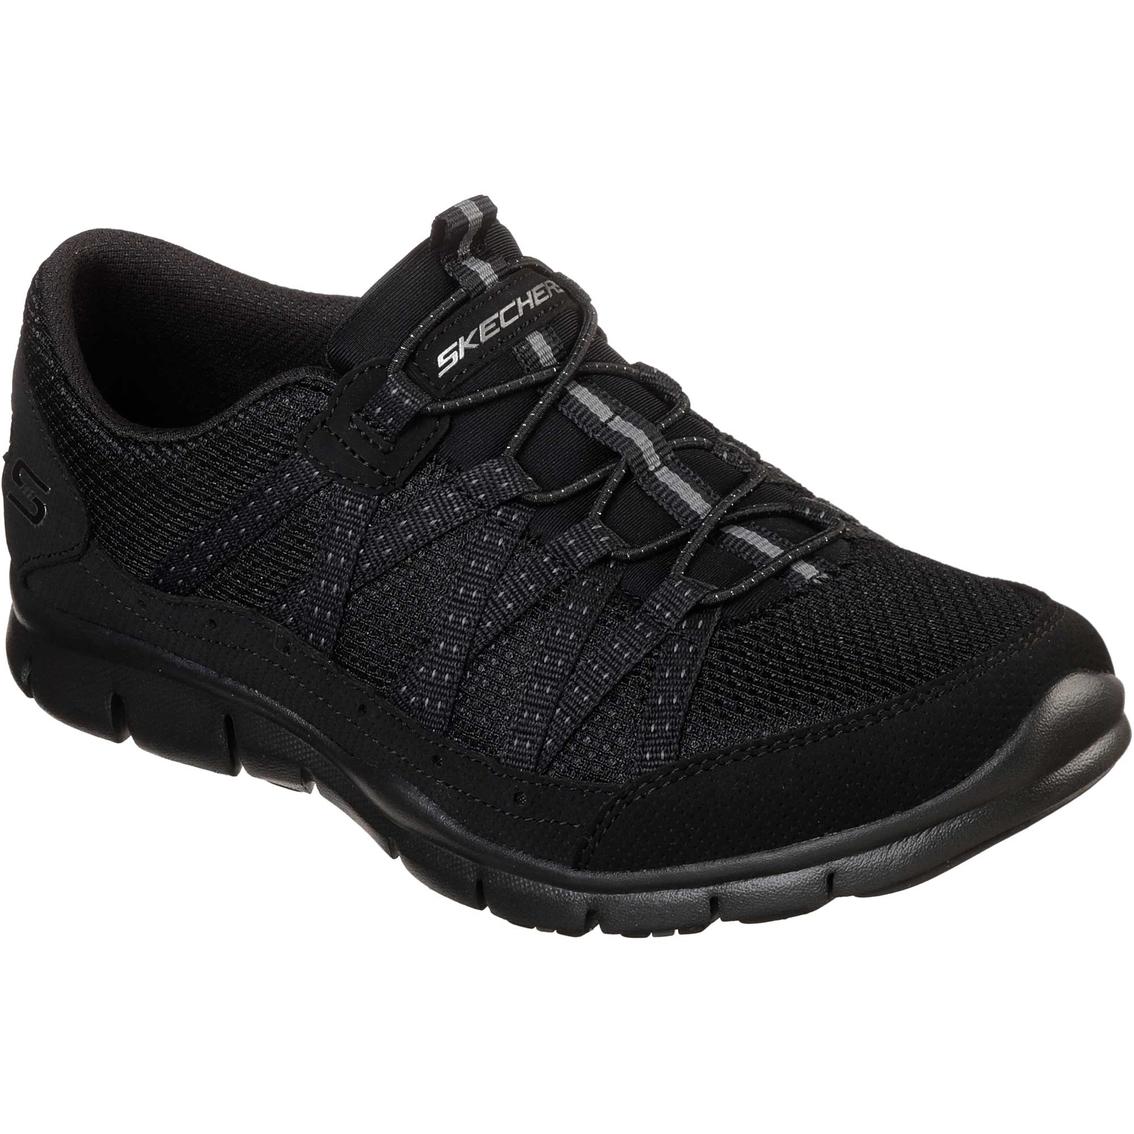 Skechers Women's Gratis Strolling Shoes